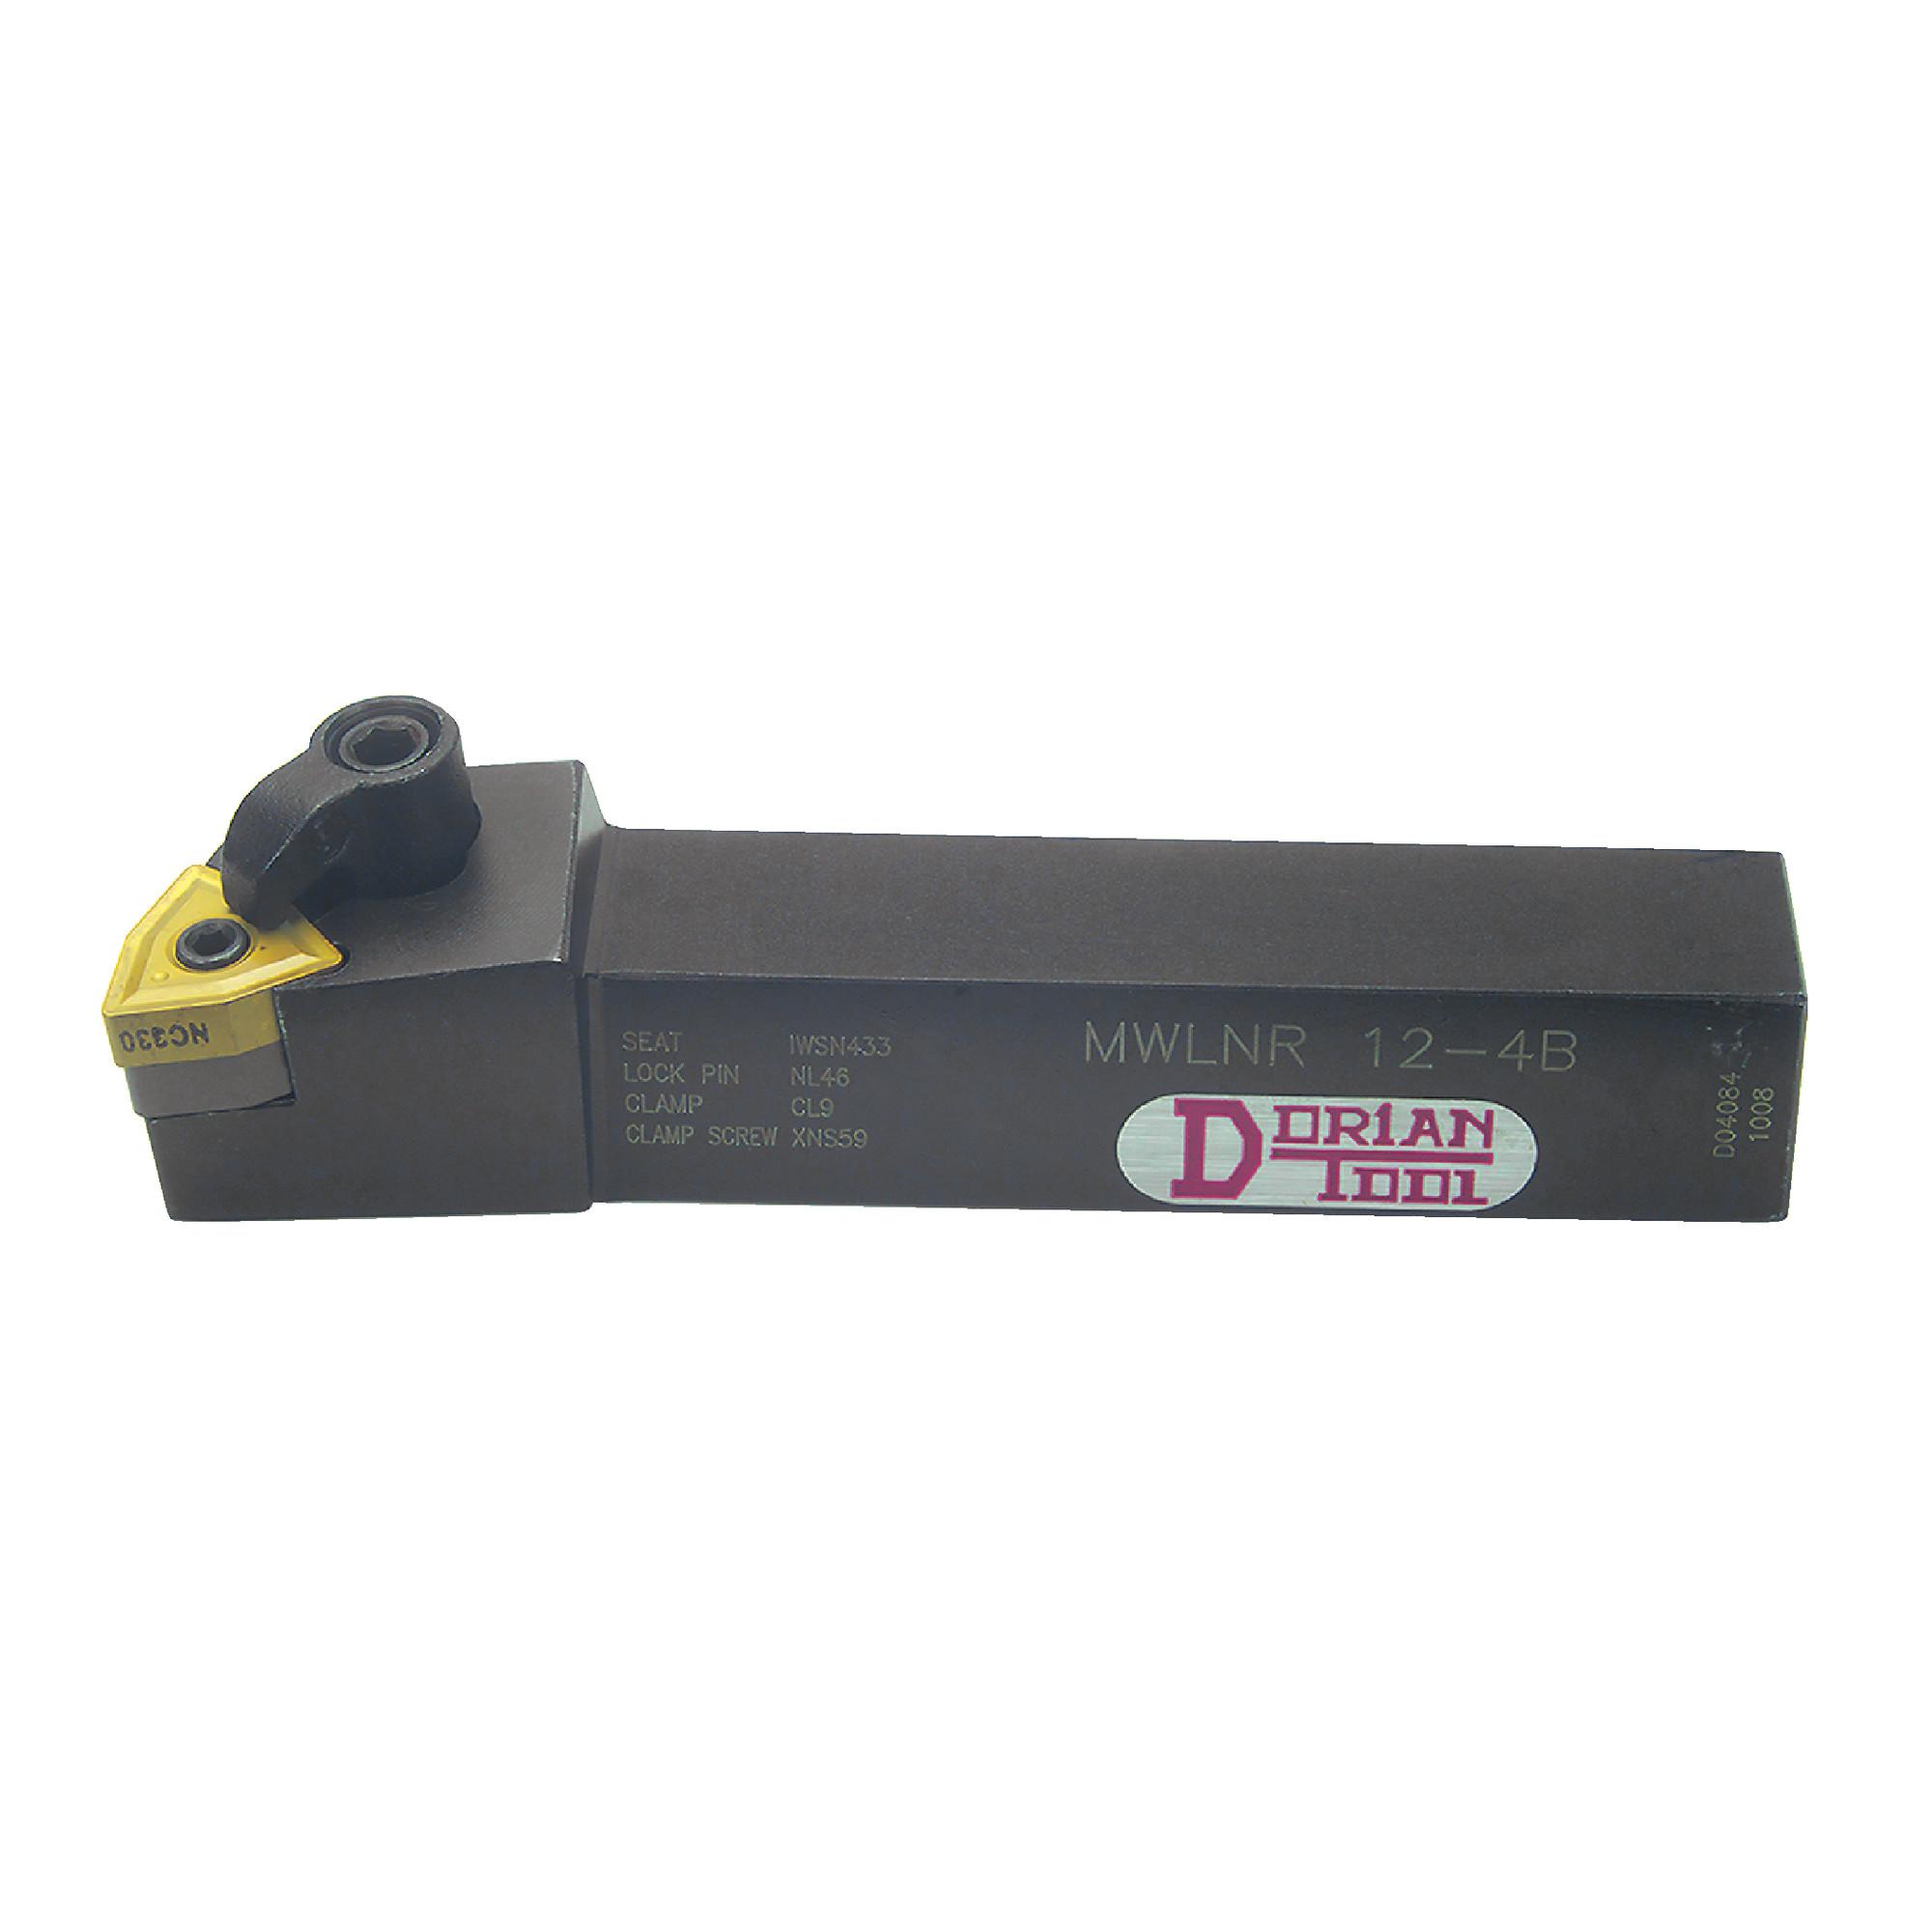 "DORIAN - MWLNR12-4B / 0.750"" External Turning Holder for WNMG43_ Inserts / Right Hand"